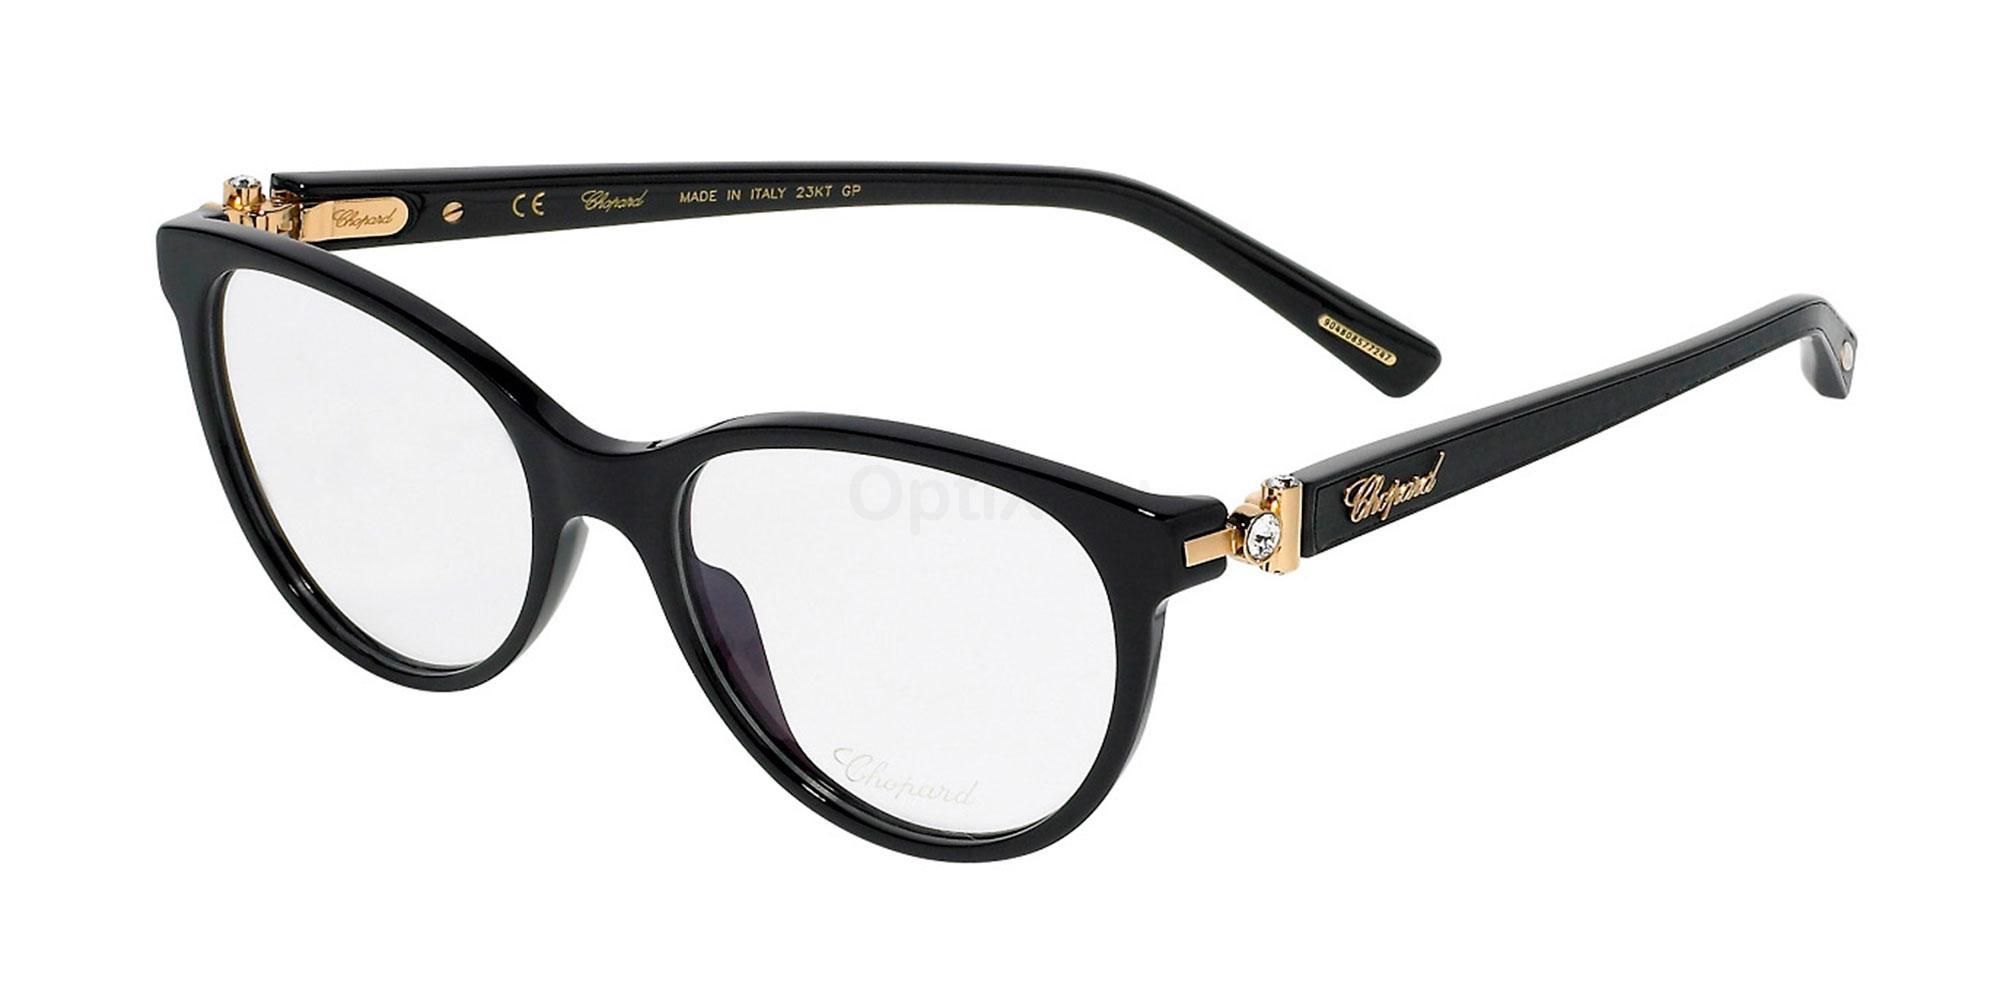 0700 VCH268S Glasses, Chopard